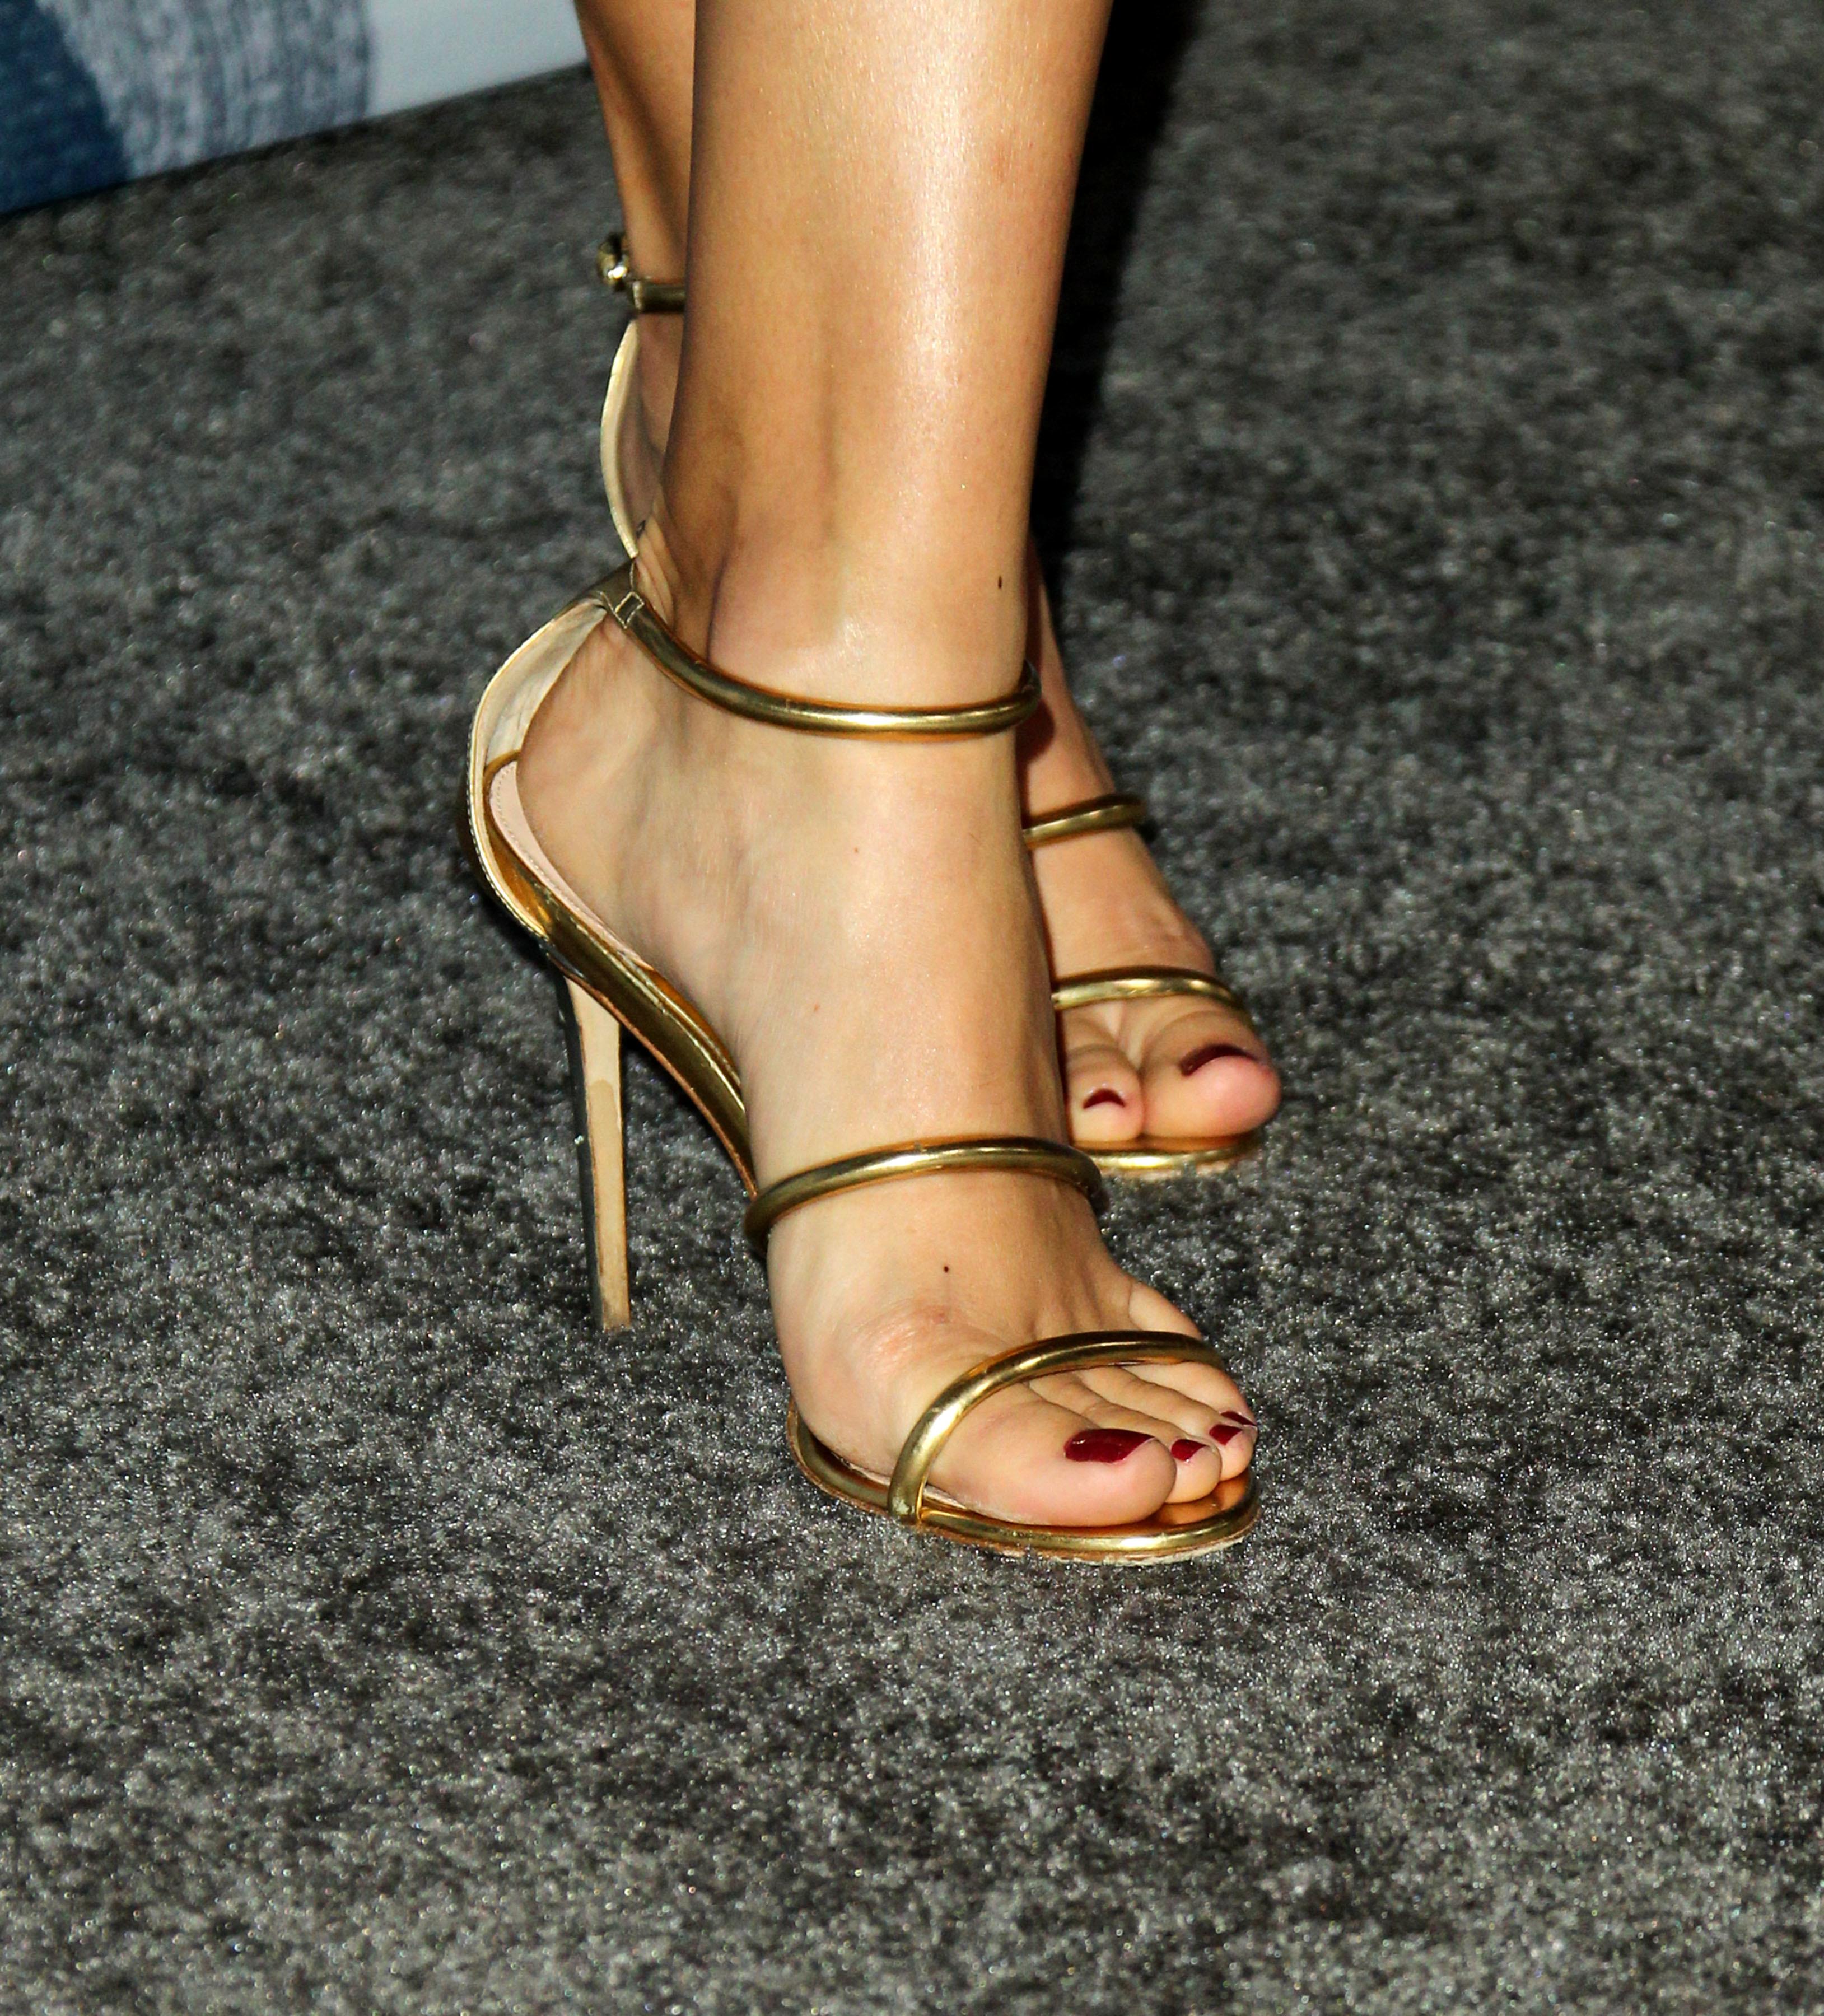 Amber stevens wests feet wikifeet 3180510 voltagebd Choice Image